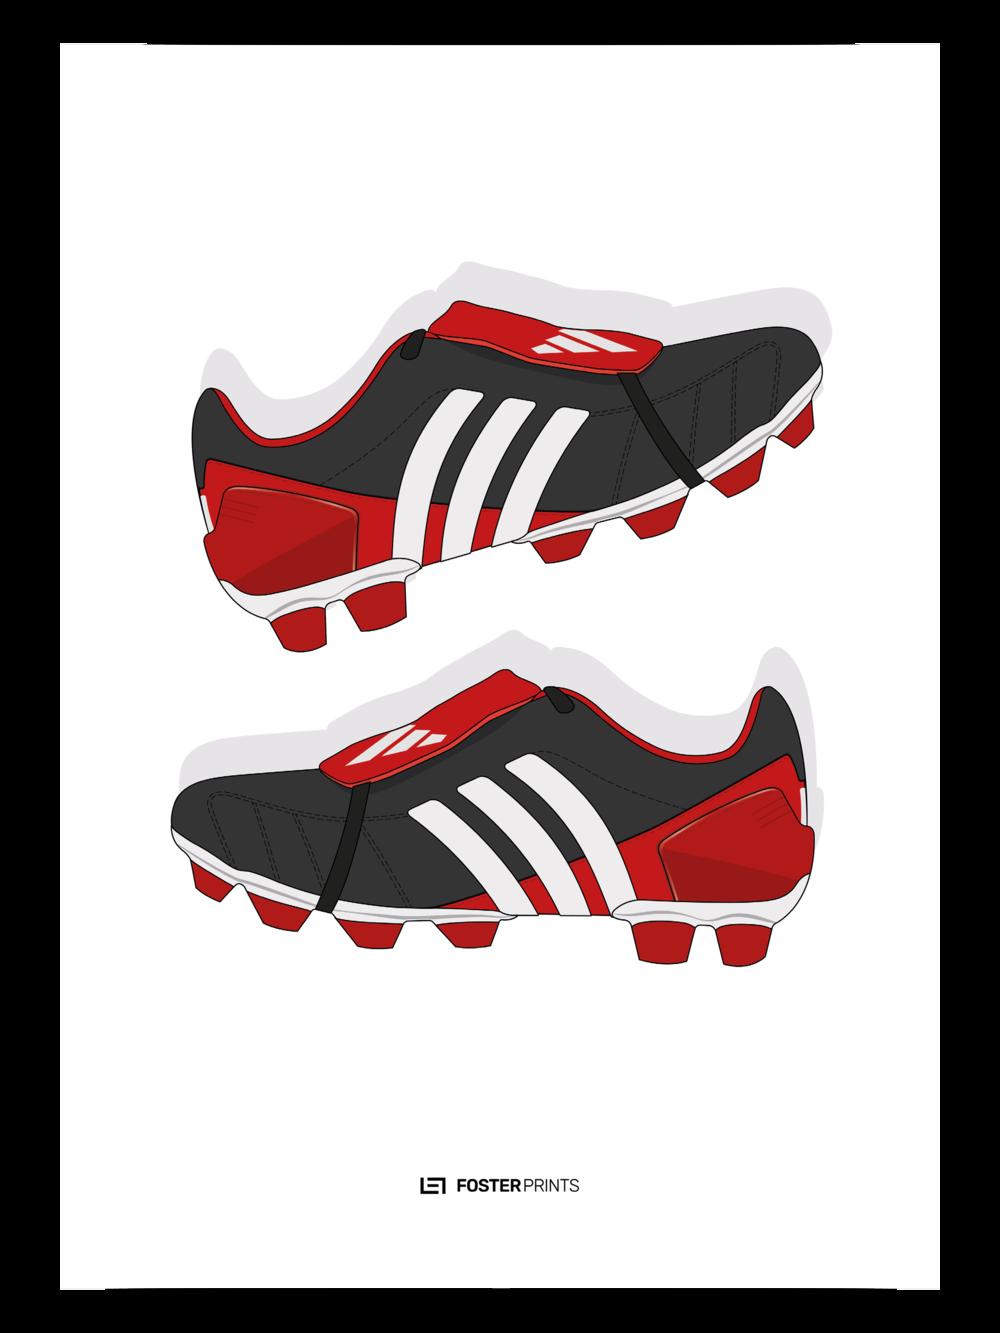 9a50130cec9 ... sale adidas predator mania red black football poster 8f550 b0873